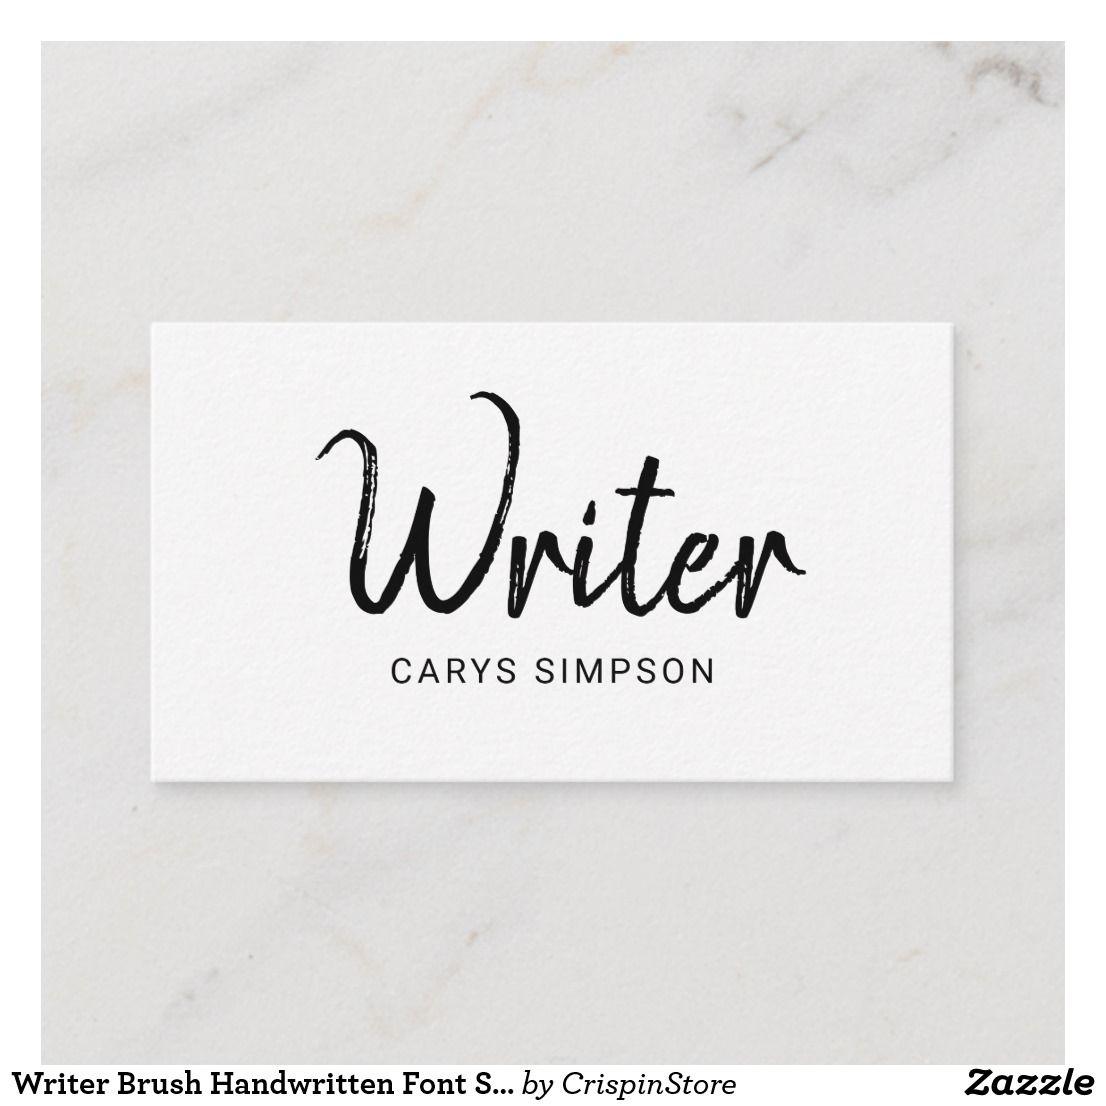 writer brush handwritten font simple white business card